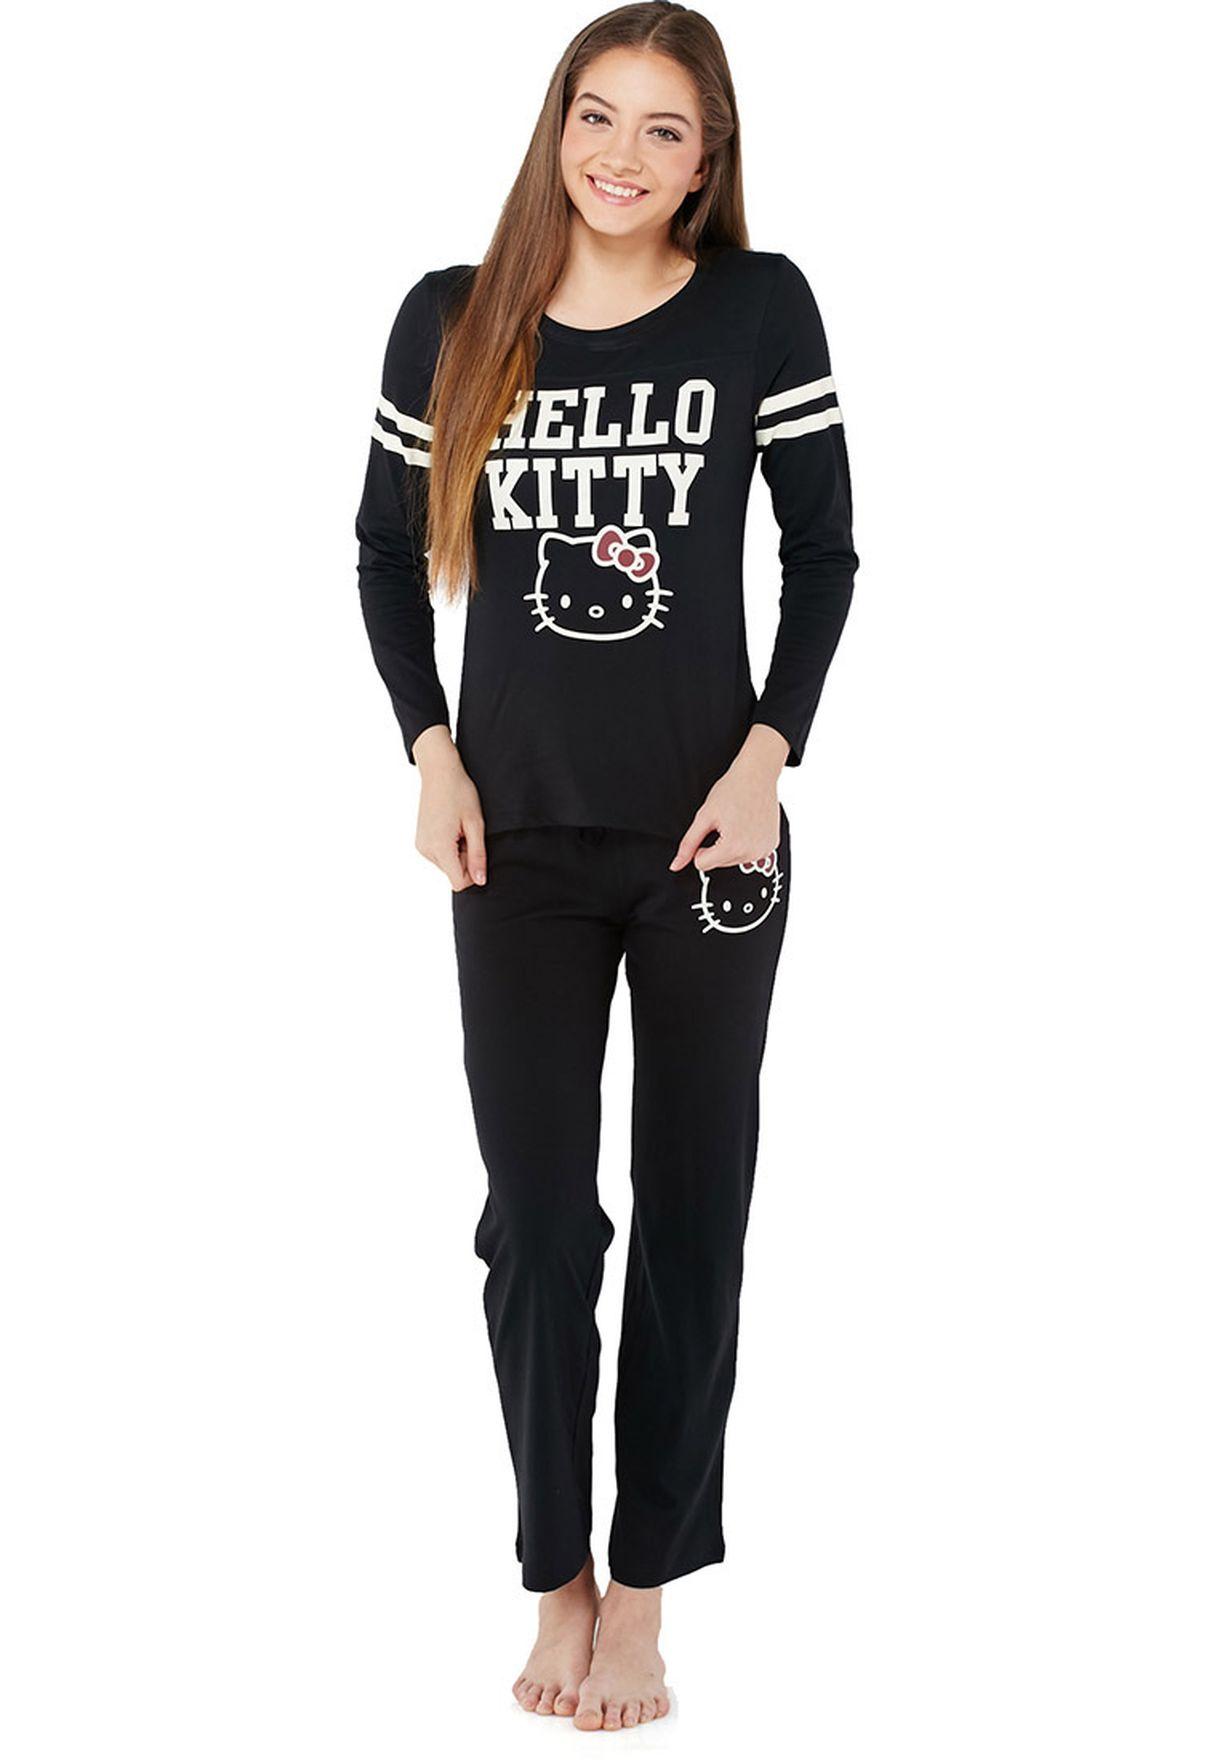 483f5aebe Shop Hello Kitty black Hello Kitty Pyjama Set for Women in Saudi ...